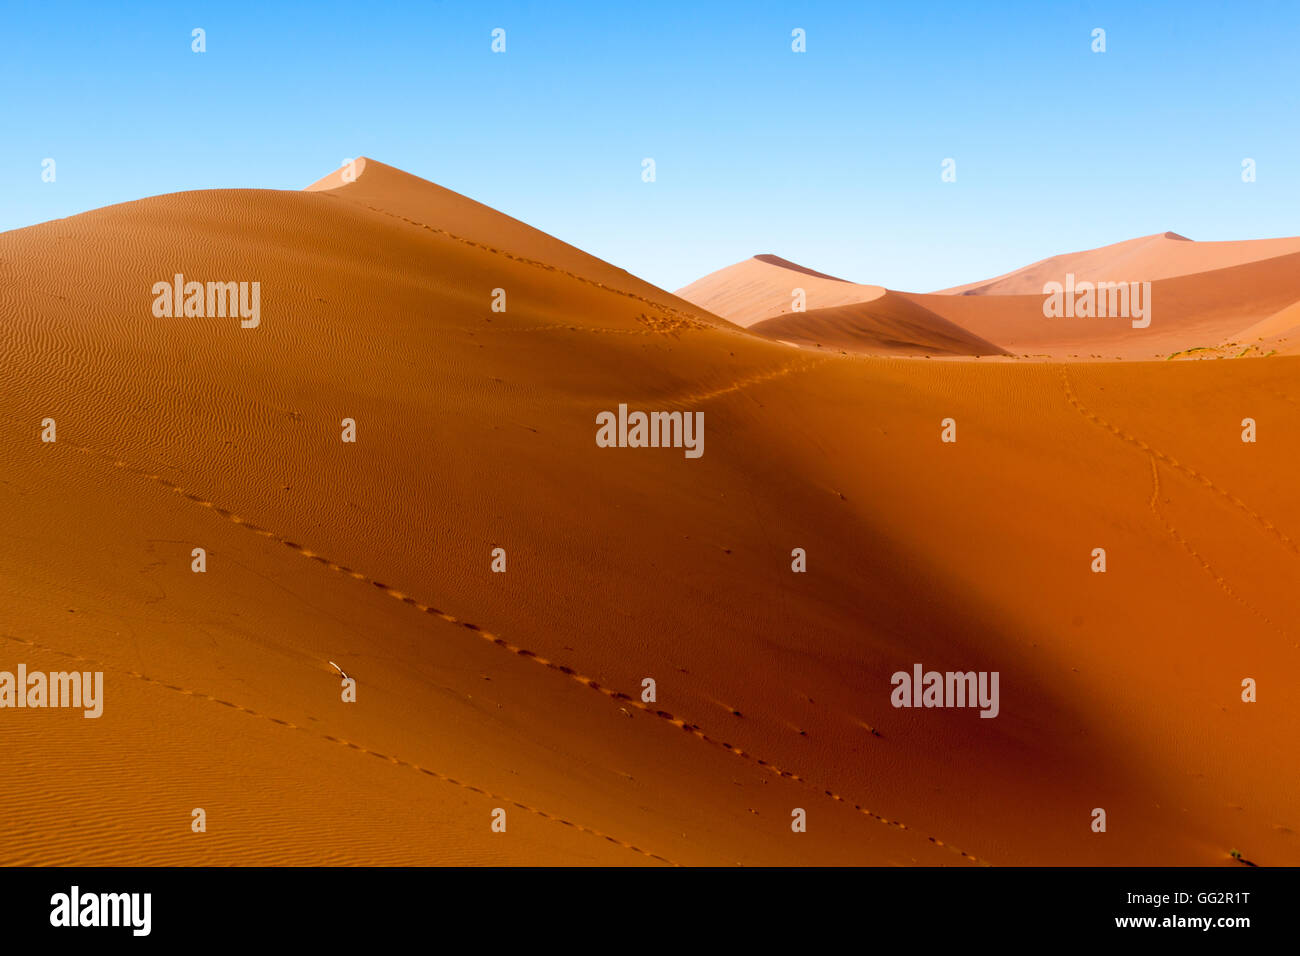 Sossusvlei Namibia Sand dunes - Stock Image